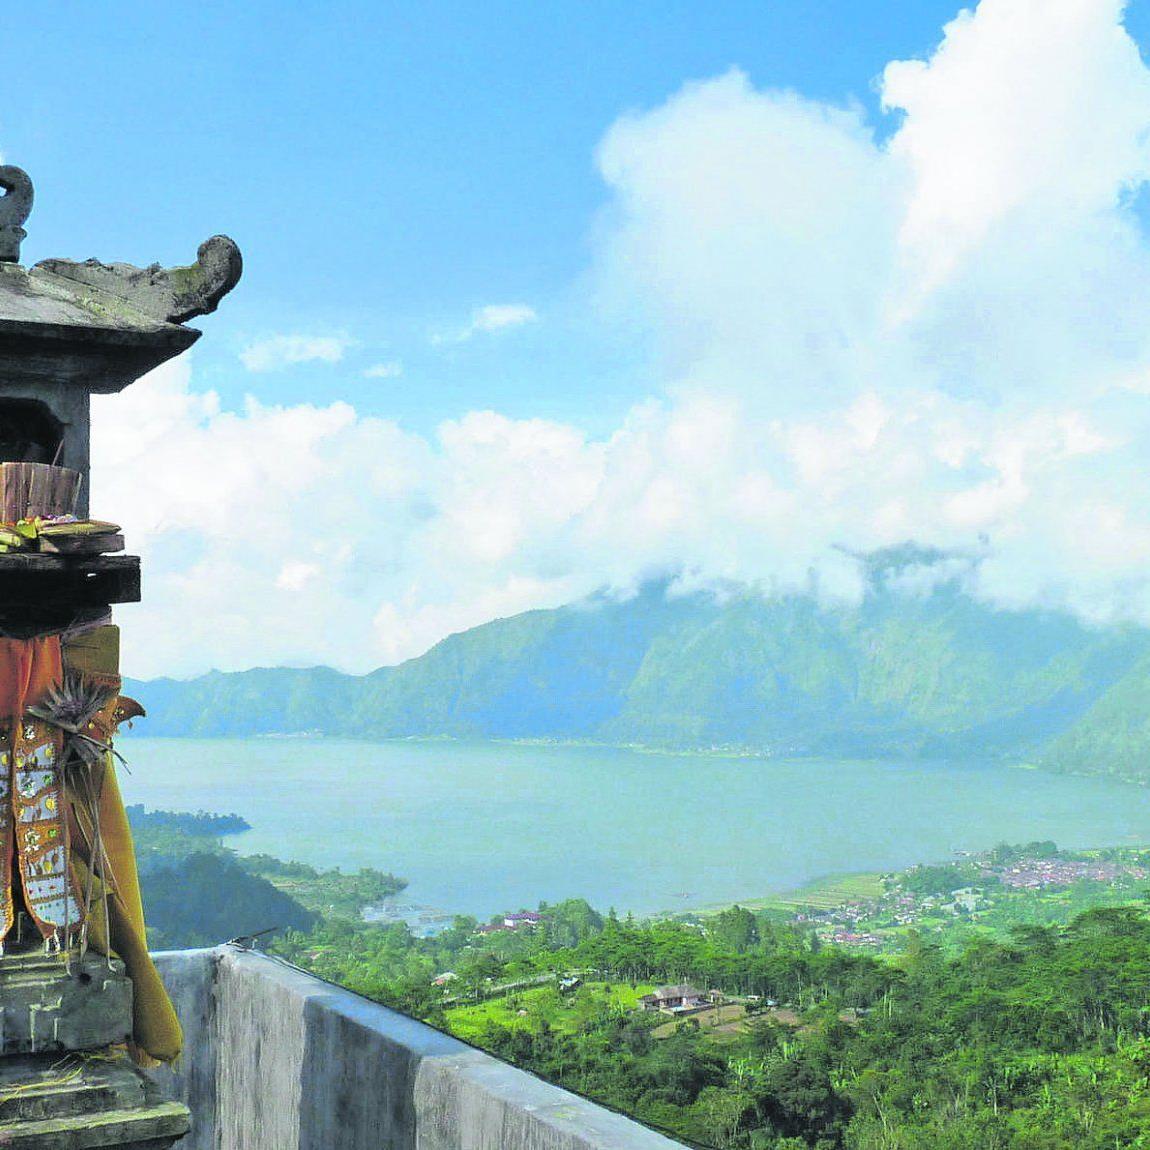 Reiseparadies Bali